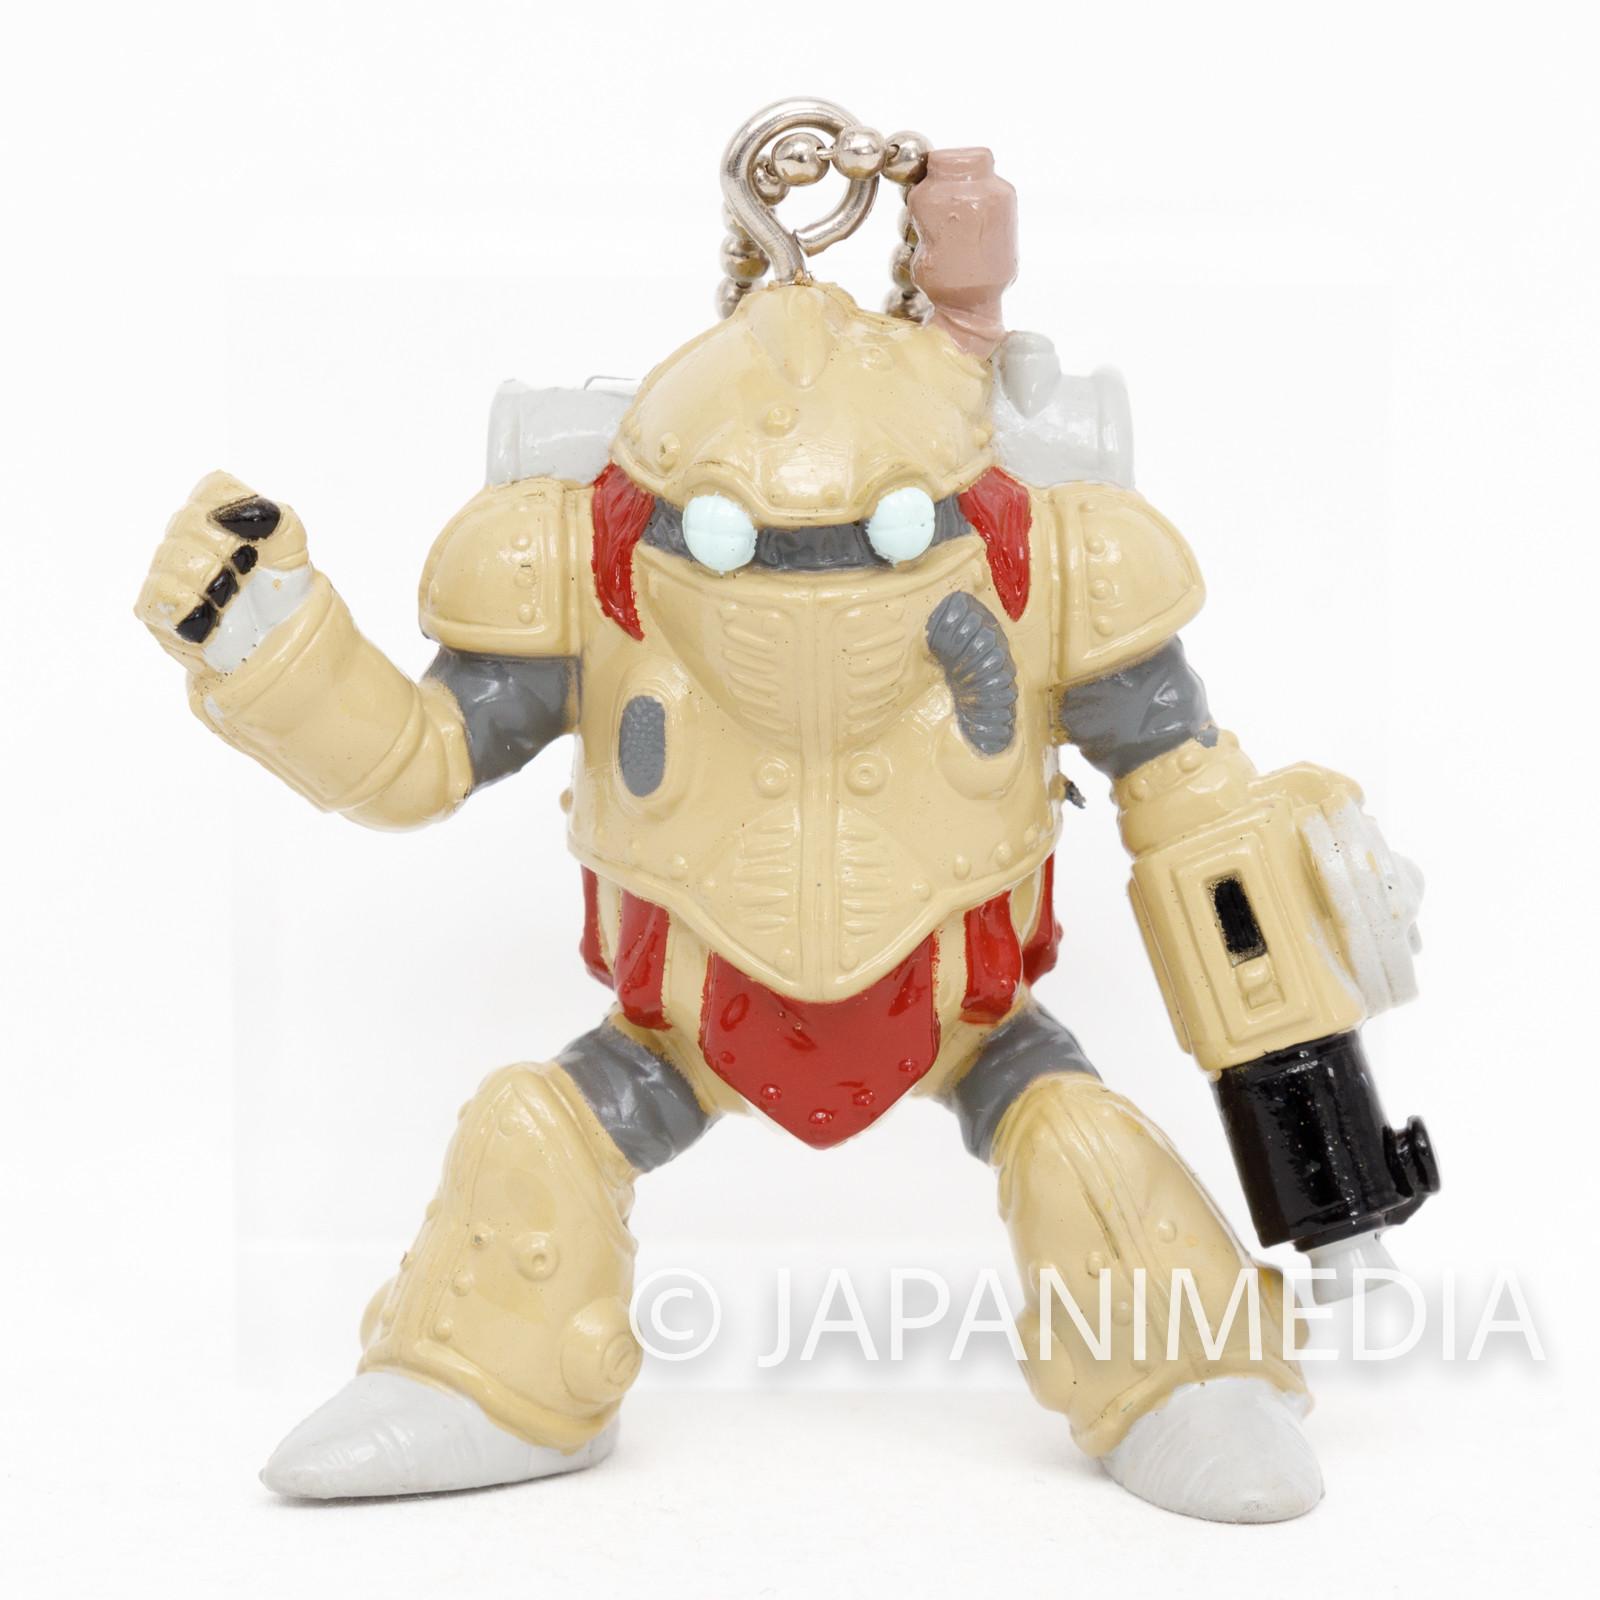 RARE! Chrono Trigger Robo Figure Ballchain Banpresto JAPAN GAME